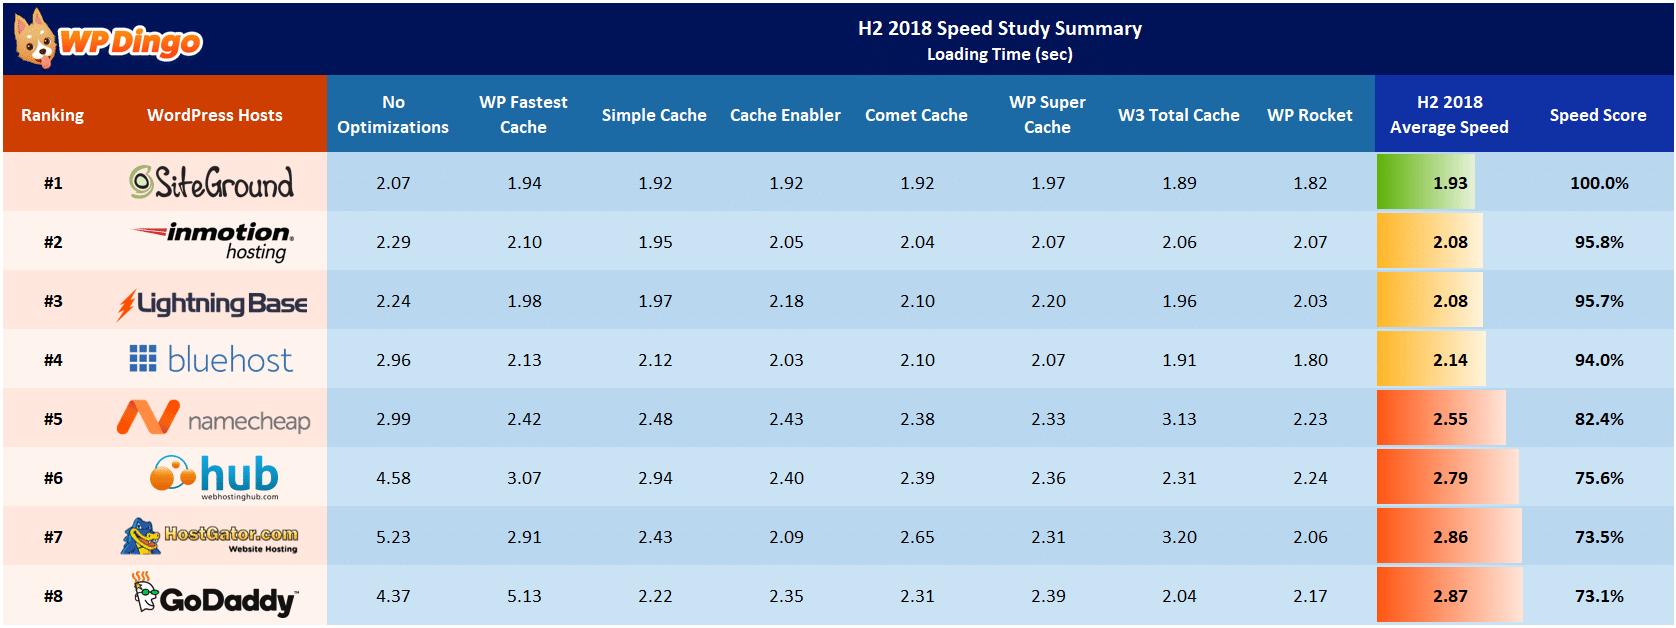 H2 2018 Speed Study Summary Table - All Hosts